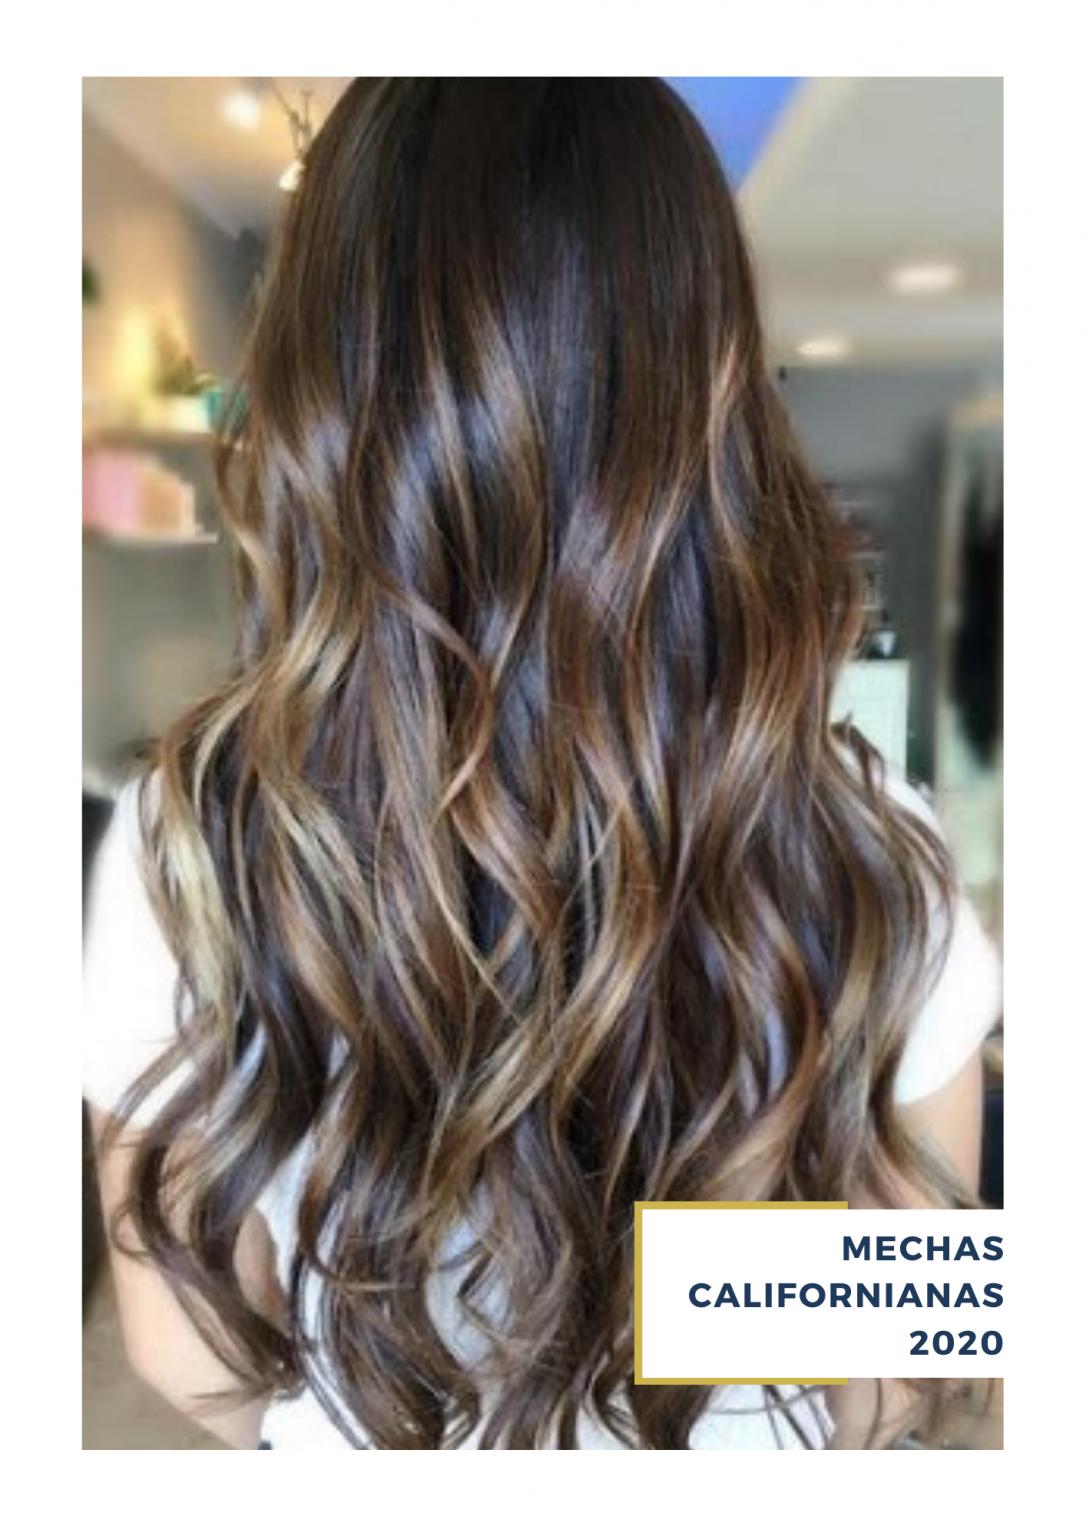 Variedad De Mechas Californianas 2020 Para Morenas Rubias Castañas Tiger Eye Hair Color Brunette Hair Color Balayage Hair